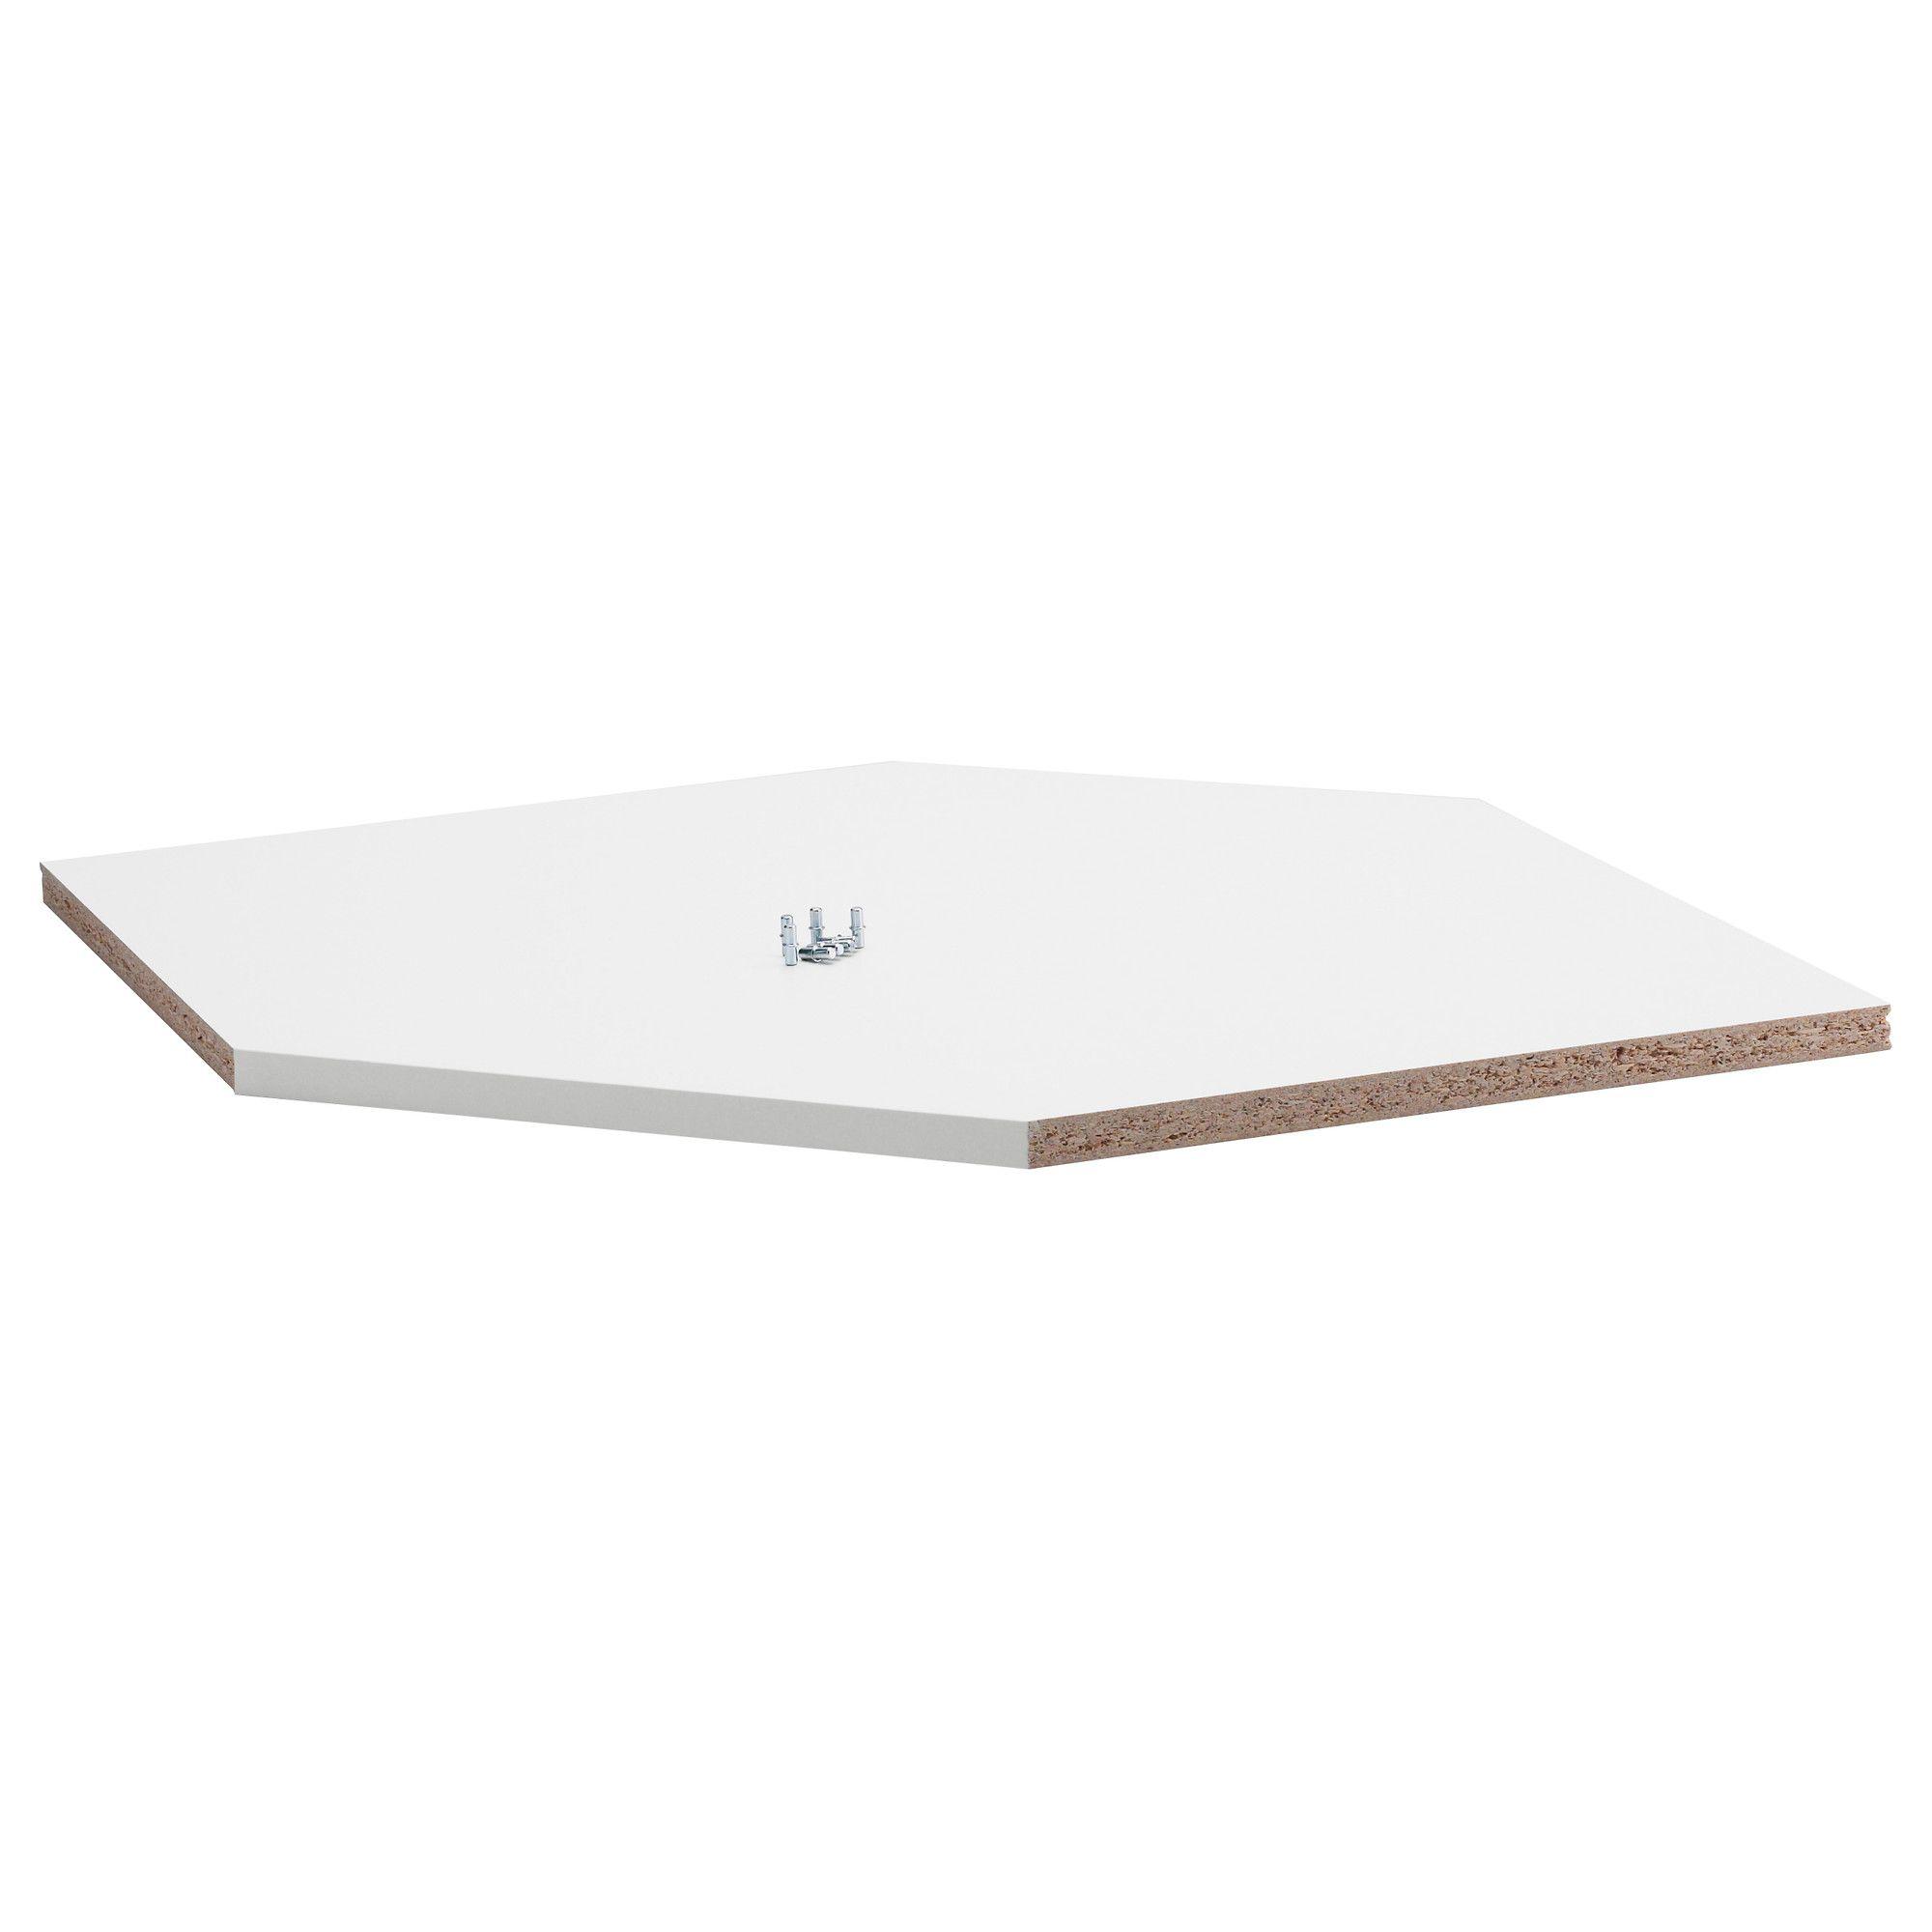 RATIONELL Shelf For Corner Wall Cabinet, Melamine White $8.00 Width: 23 1/2